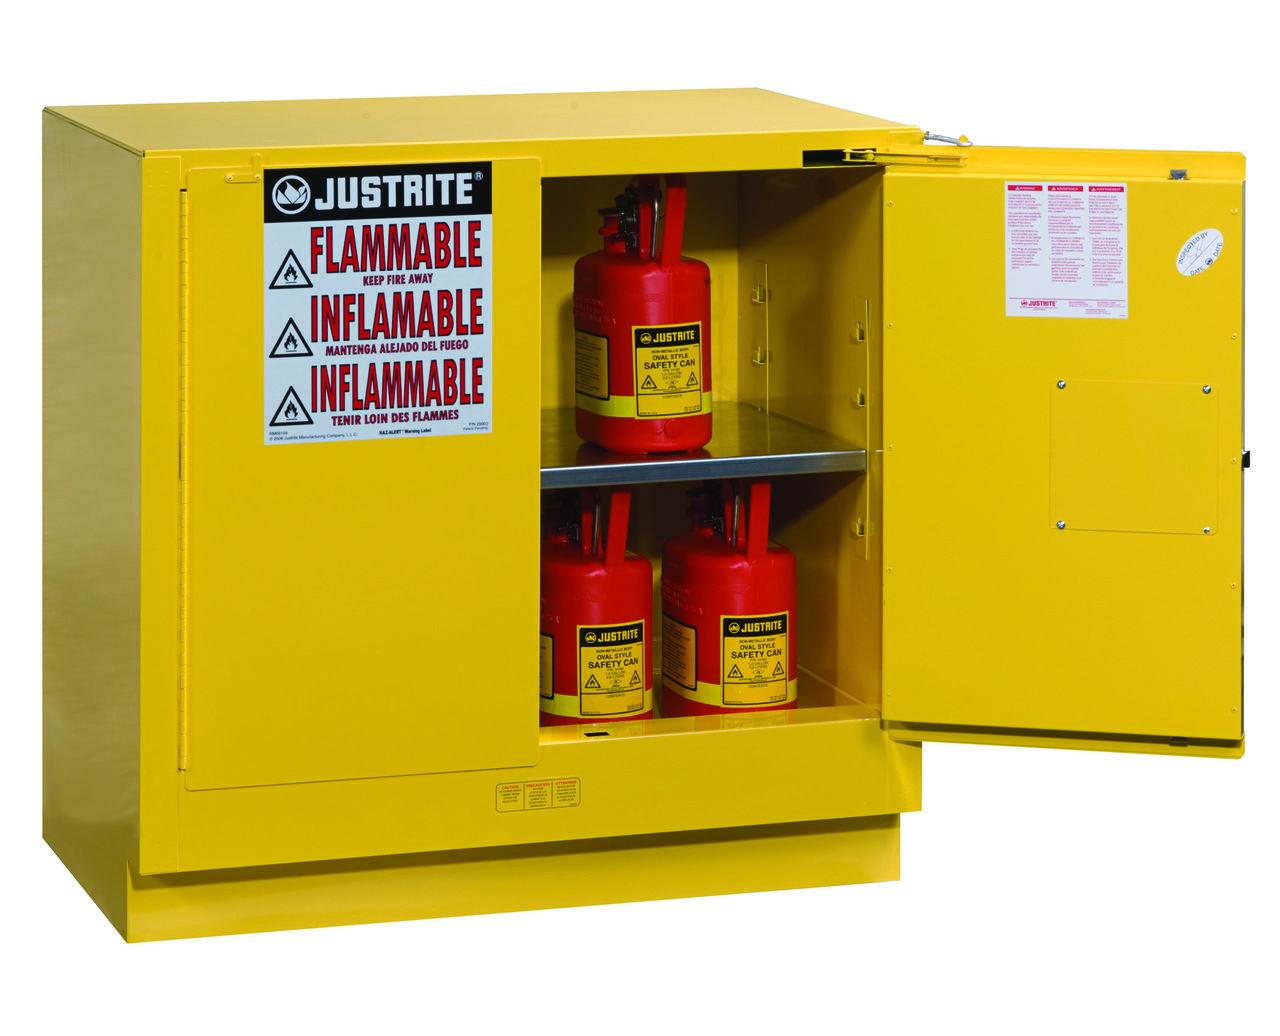 Justrite 892320 22 Gallon Undercounter Flammable Safety Cabinet Adjustable Shelving Locker Storage Basic Office Supplies